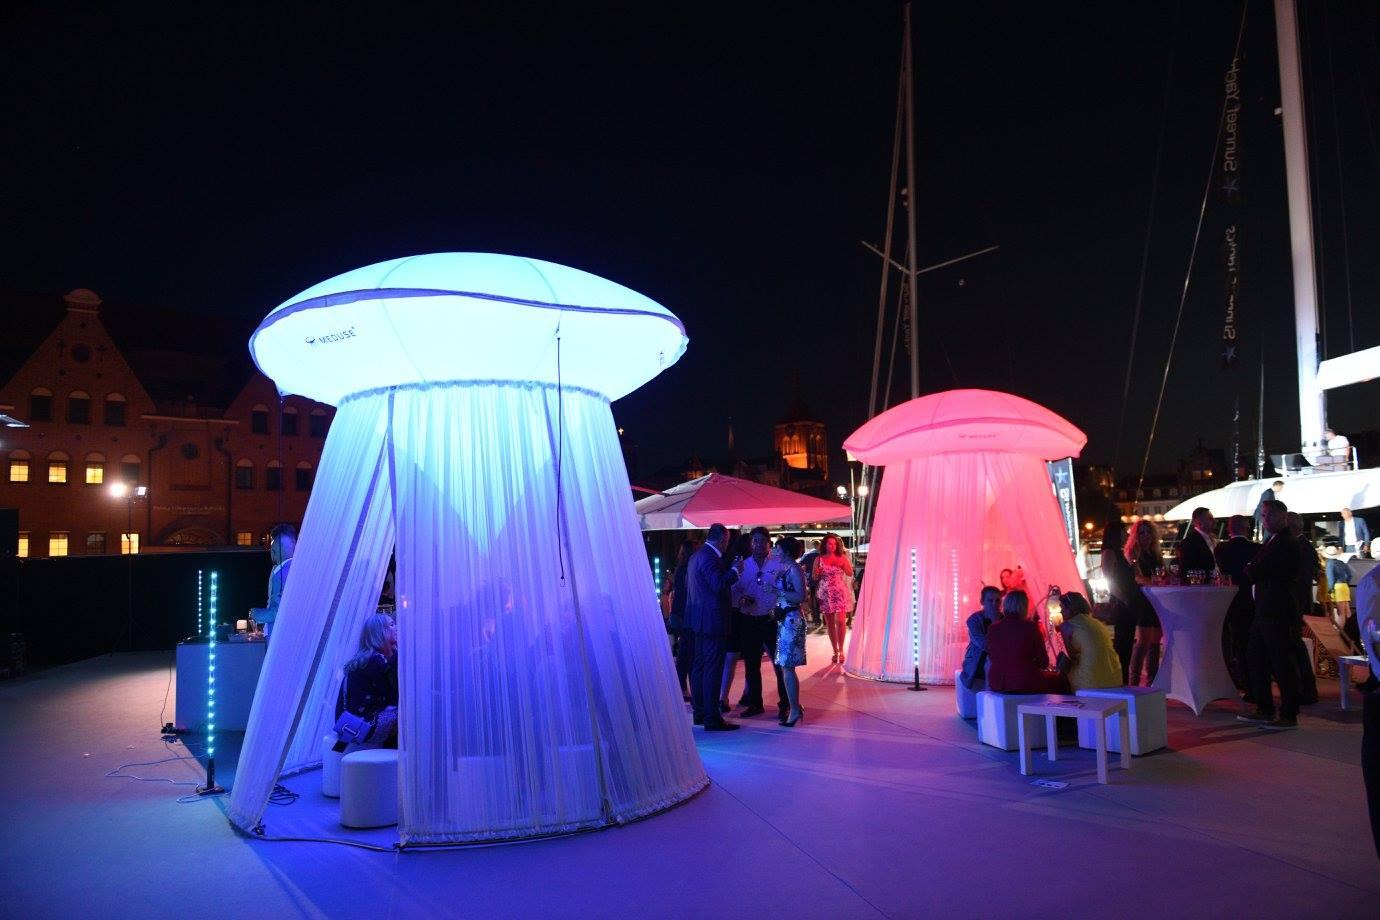 meduse events Poland